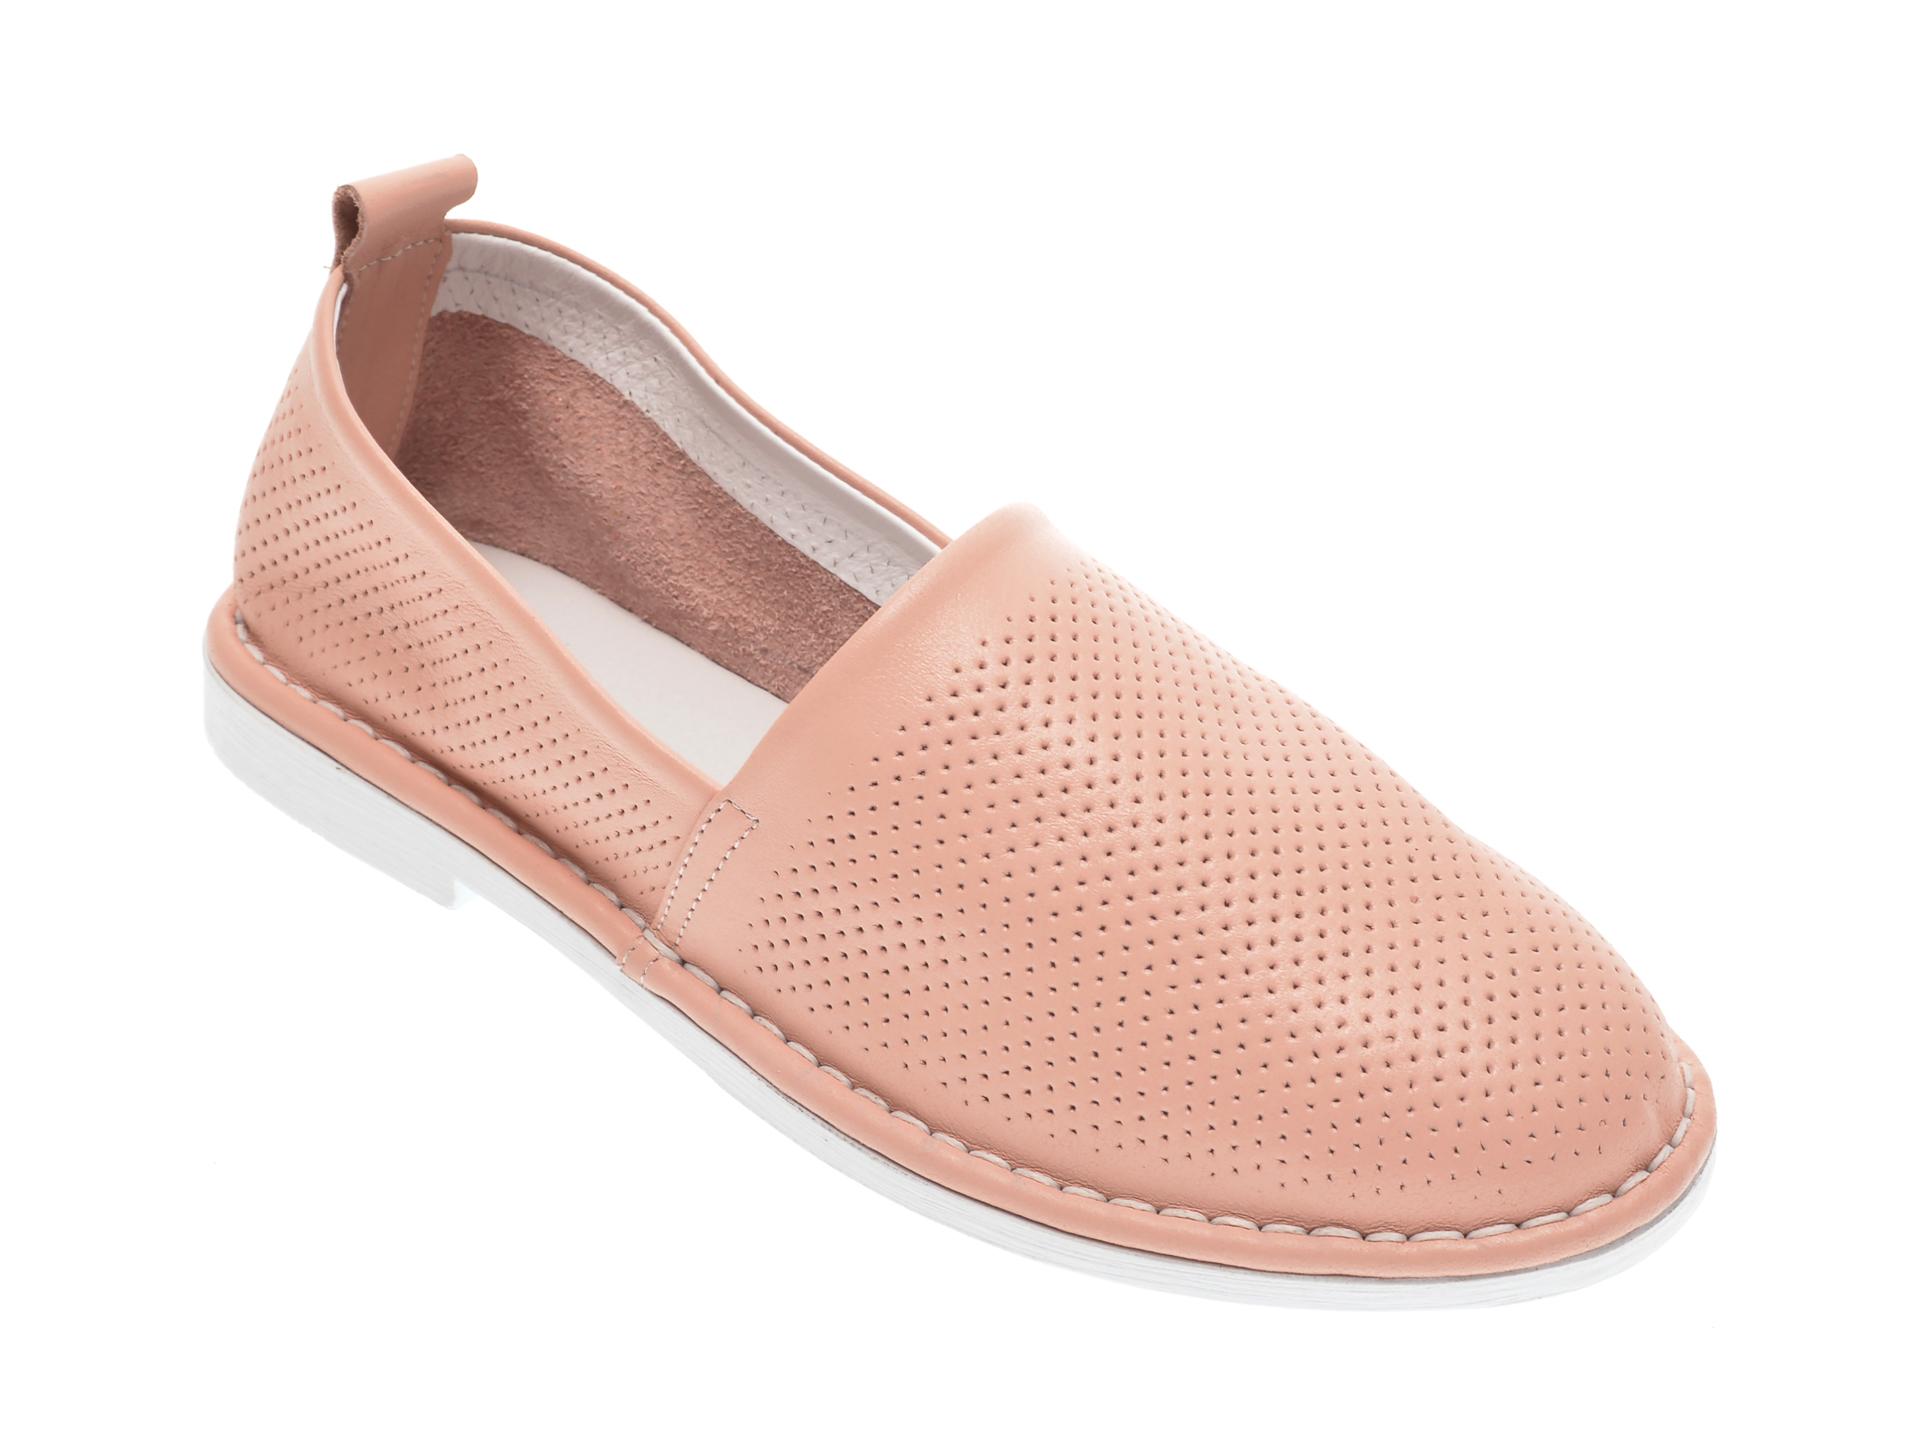 Pantofi LE BERDE roz, 76100M5, din piele naturala